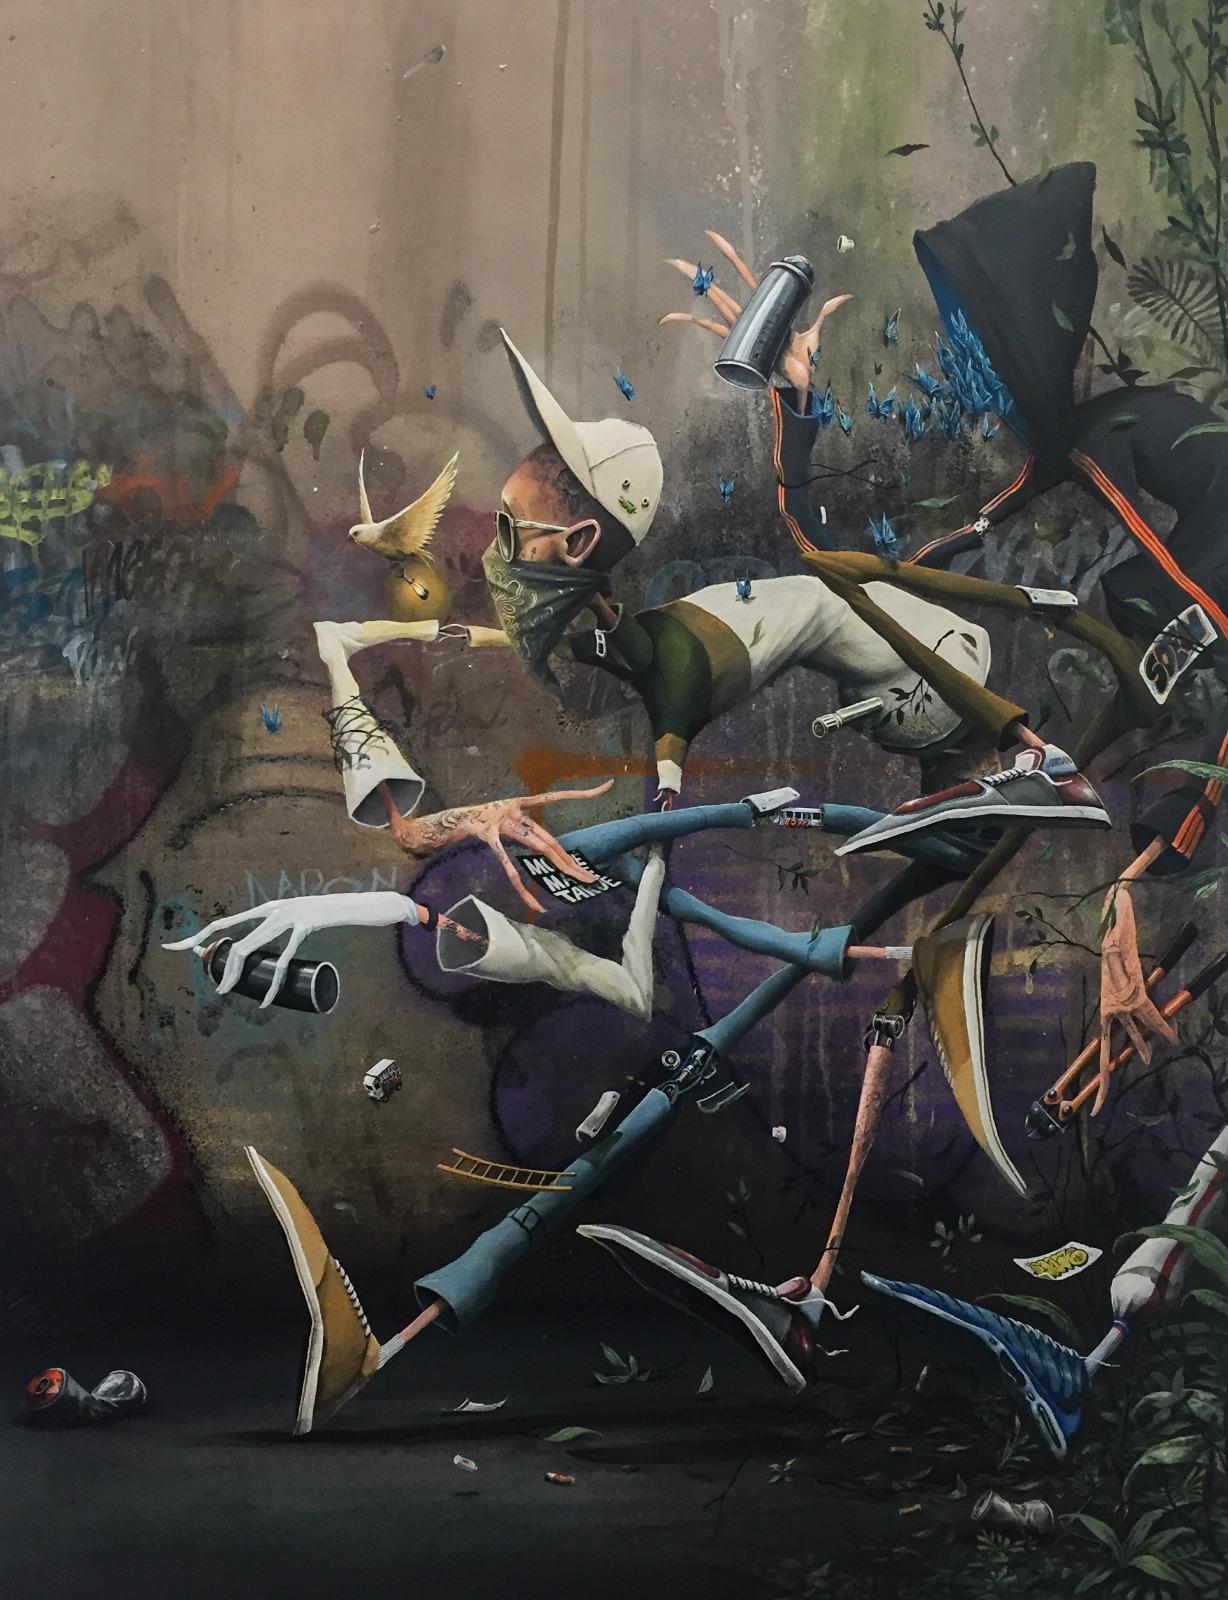 maye street art